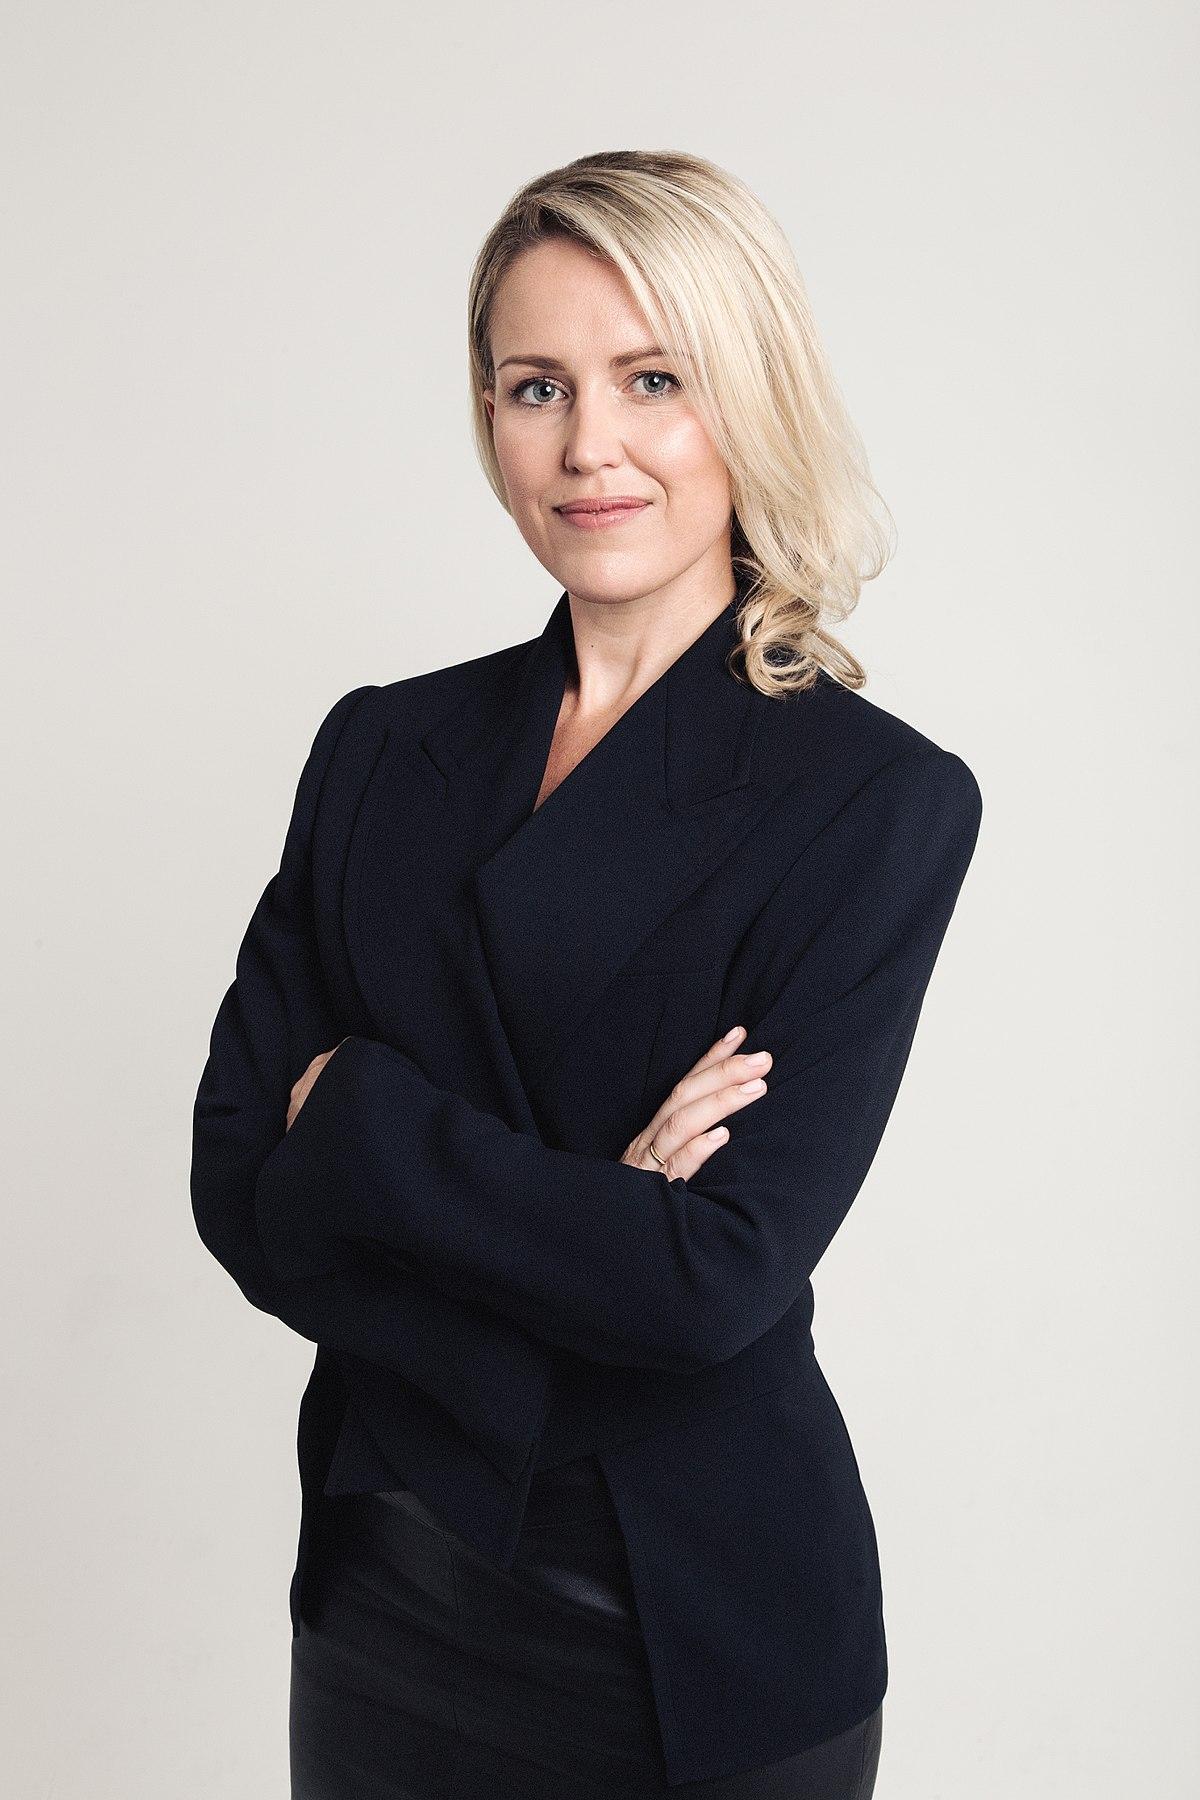 Jennifer Robinson (lawyer) - Wikipedia - 229.3KB